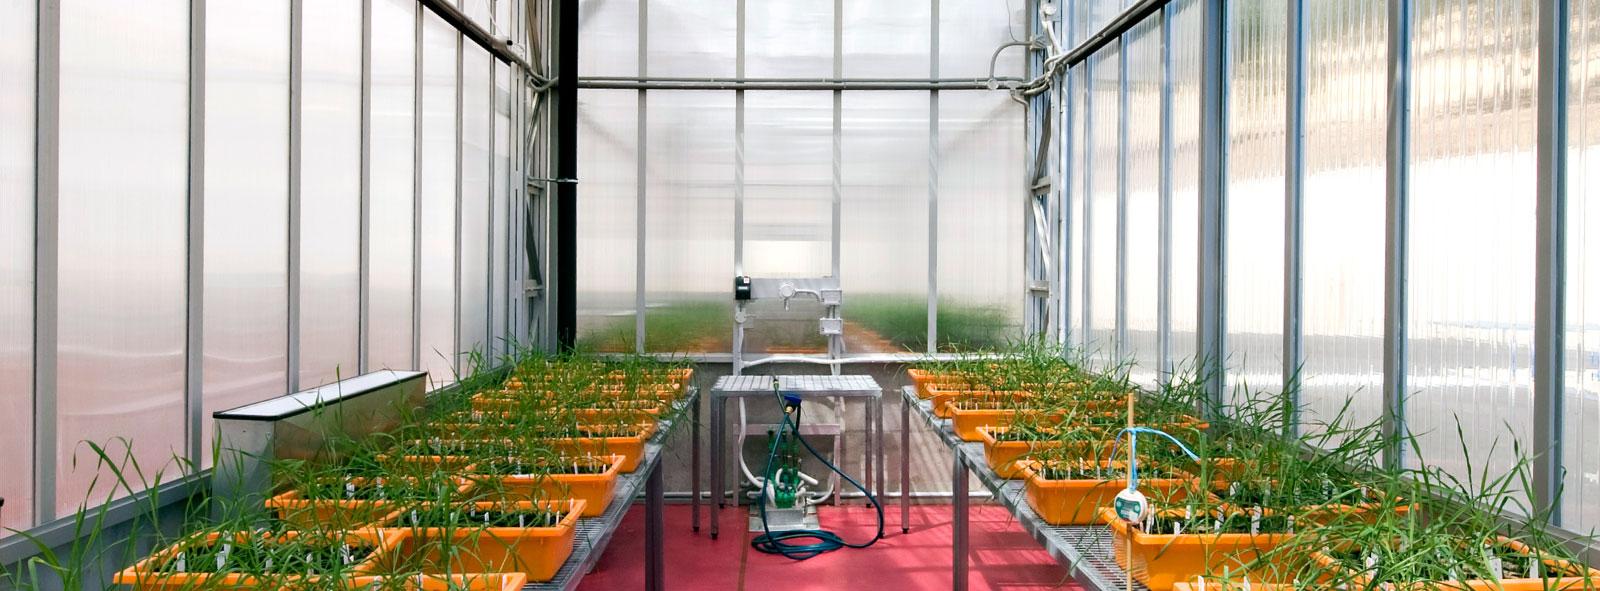 H2o-Architects-Melbourne-University-of-Adelaide-Plant-Accelerator-02